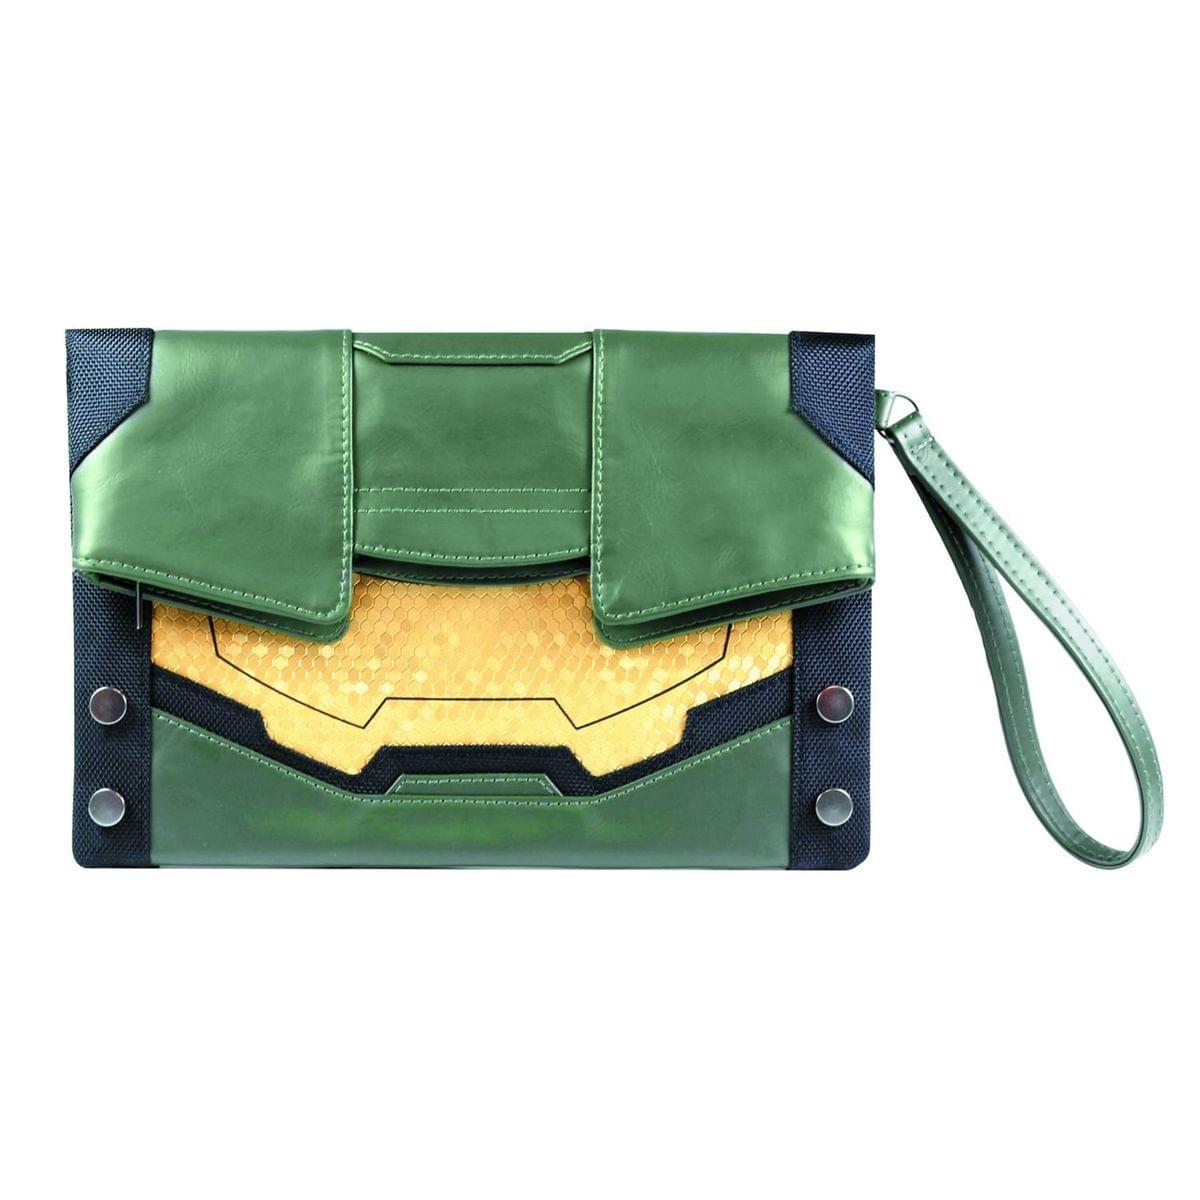 Purse Halo Graphic Clutch Bag